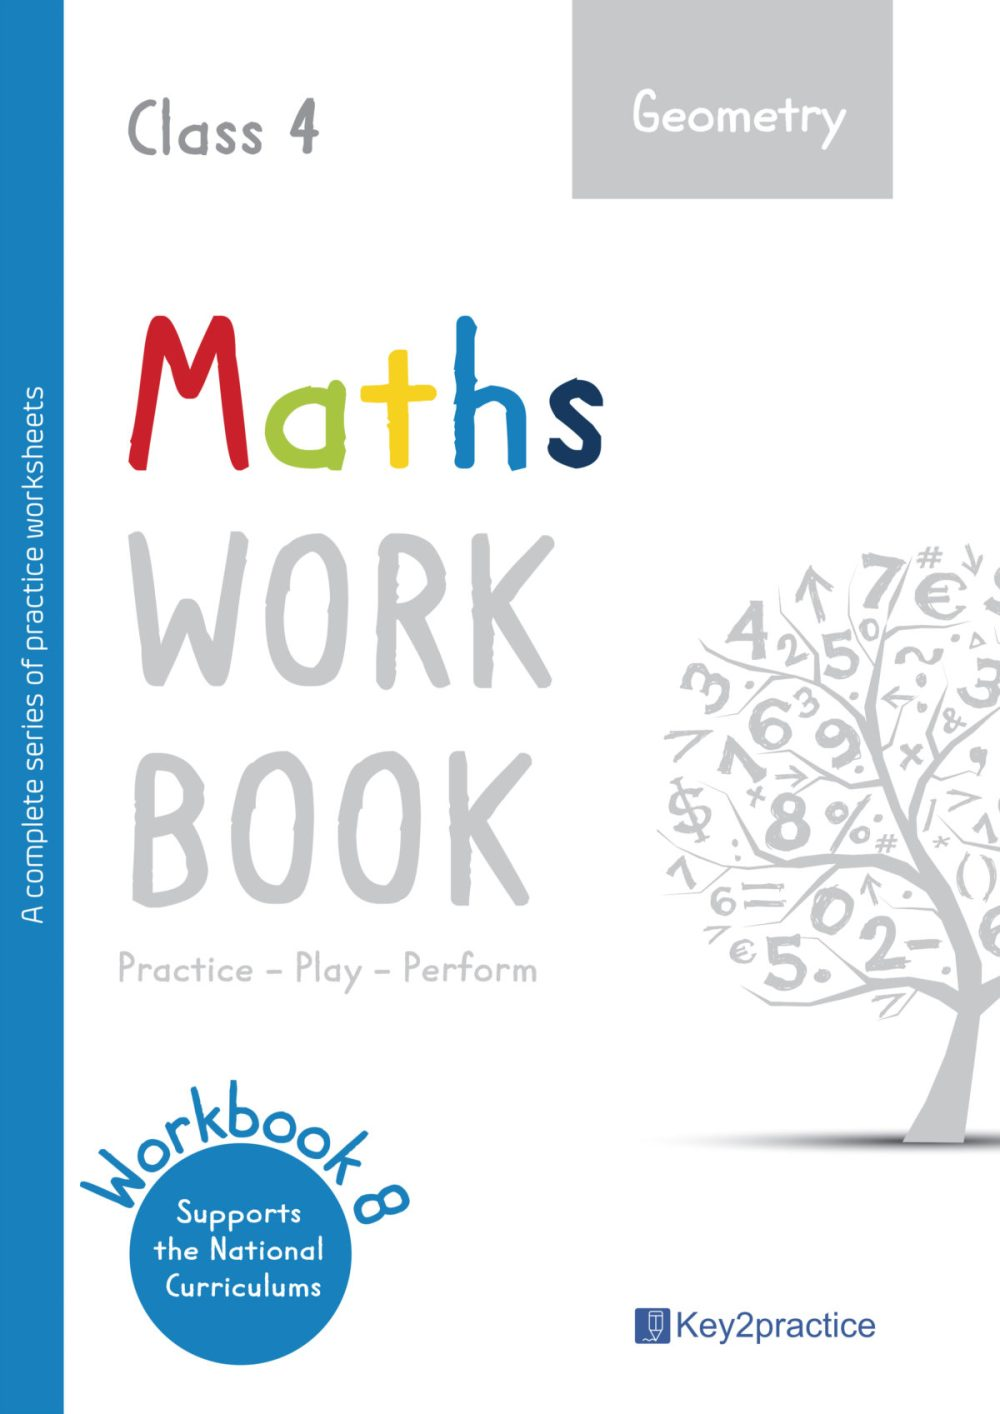 medium resolution of Grade 4 'Geometry' worksheets I Maths - key2practice Workbooks